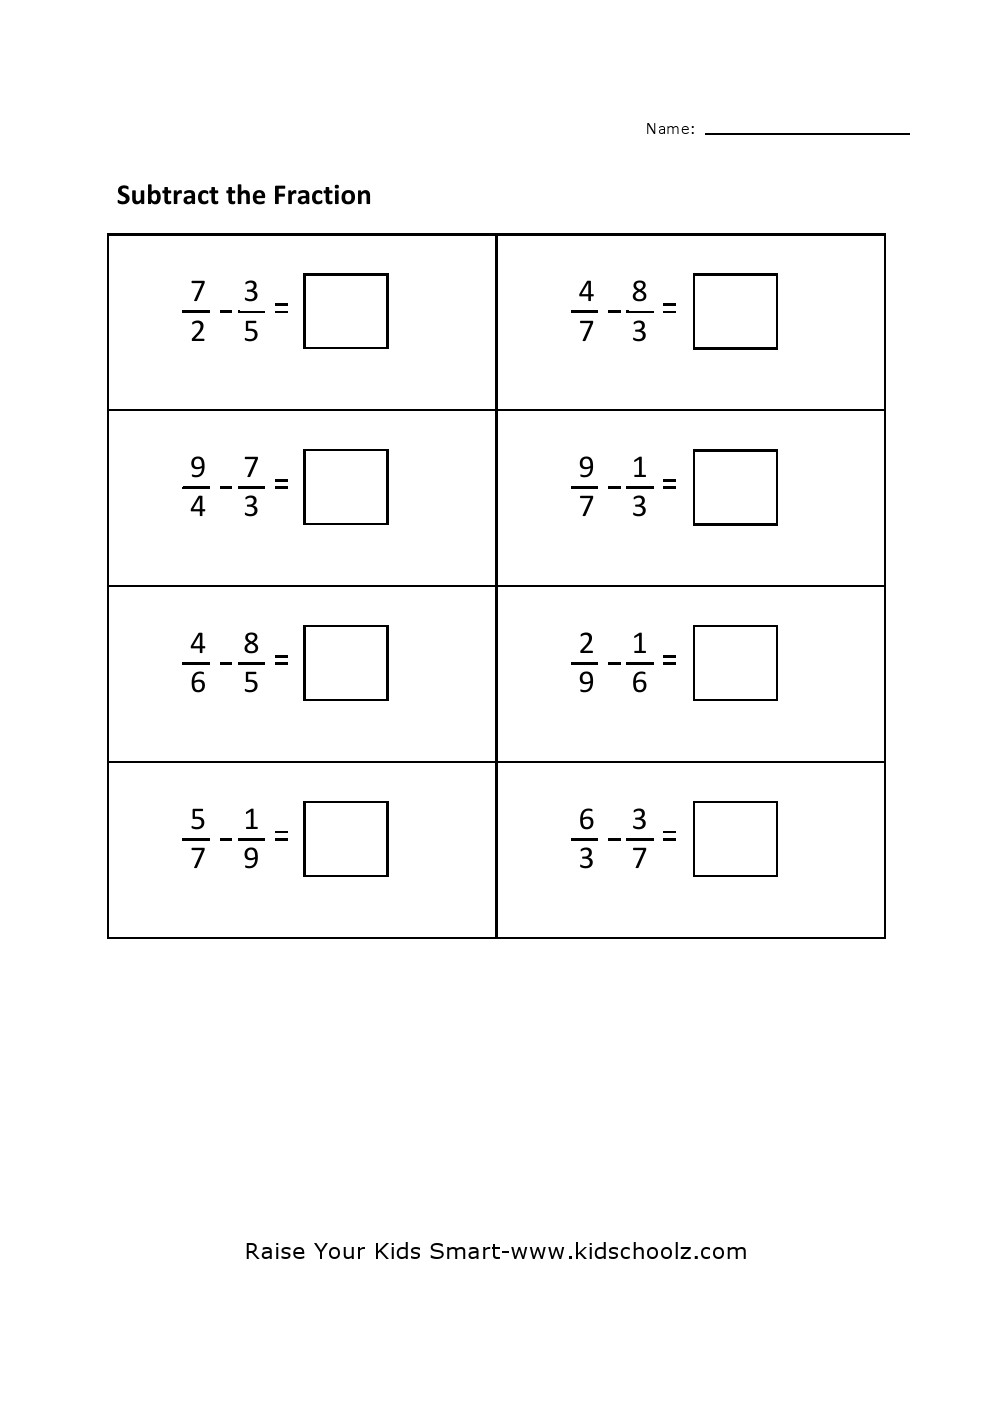 medium resolution of Grade 4 - Fraction Subtraction Worksheet 4 - Kidschoolz